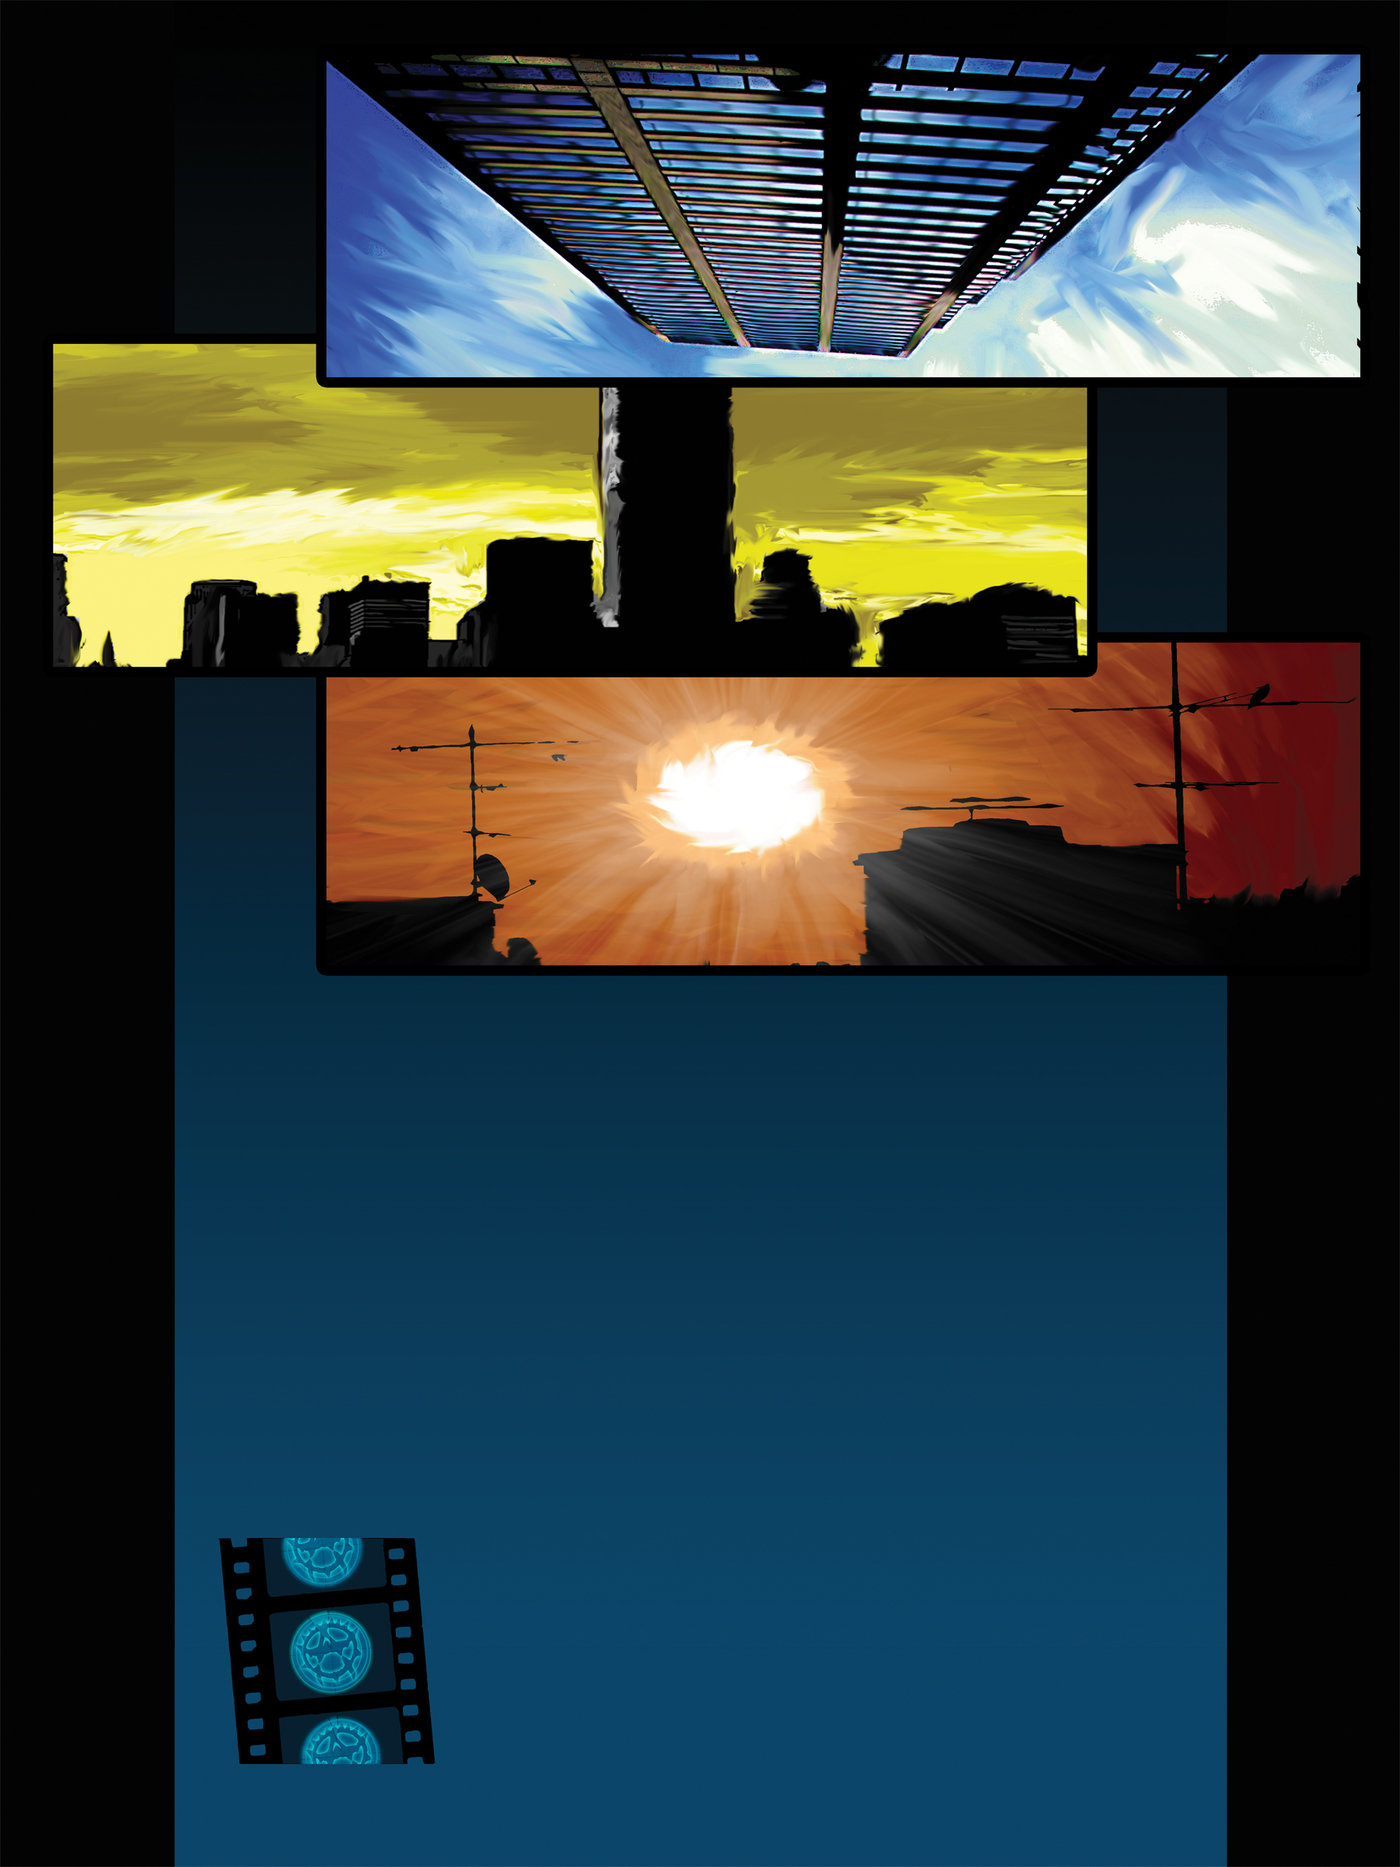 Gangland D20 RPG by Richard Sanchez at Coroflot com